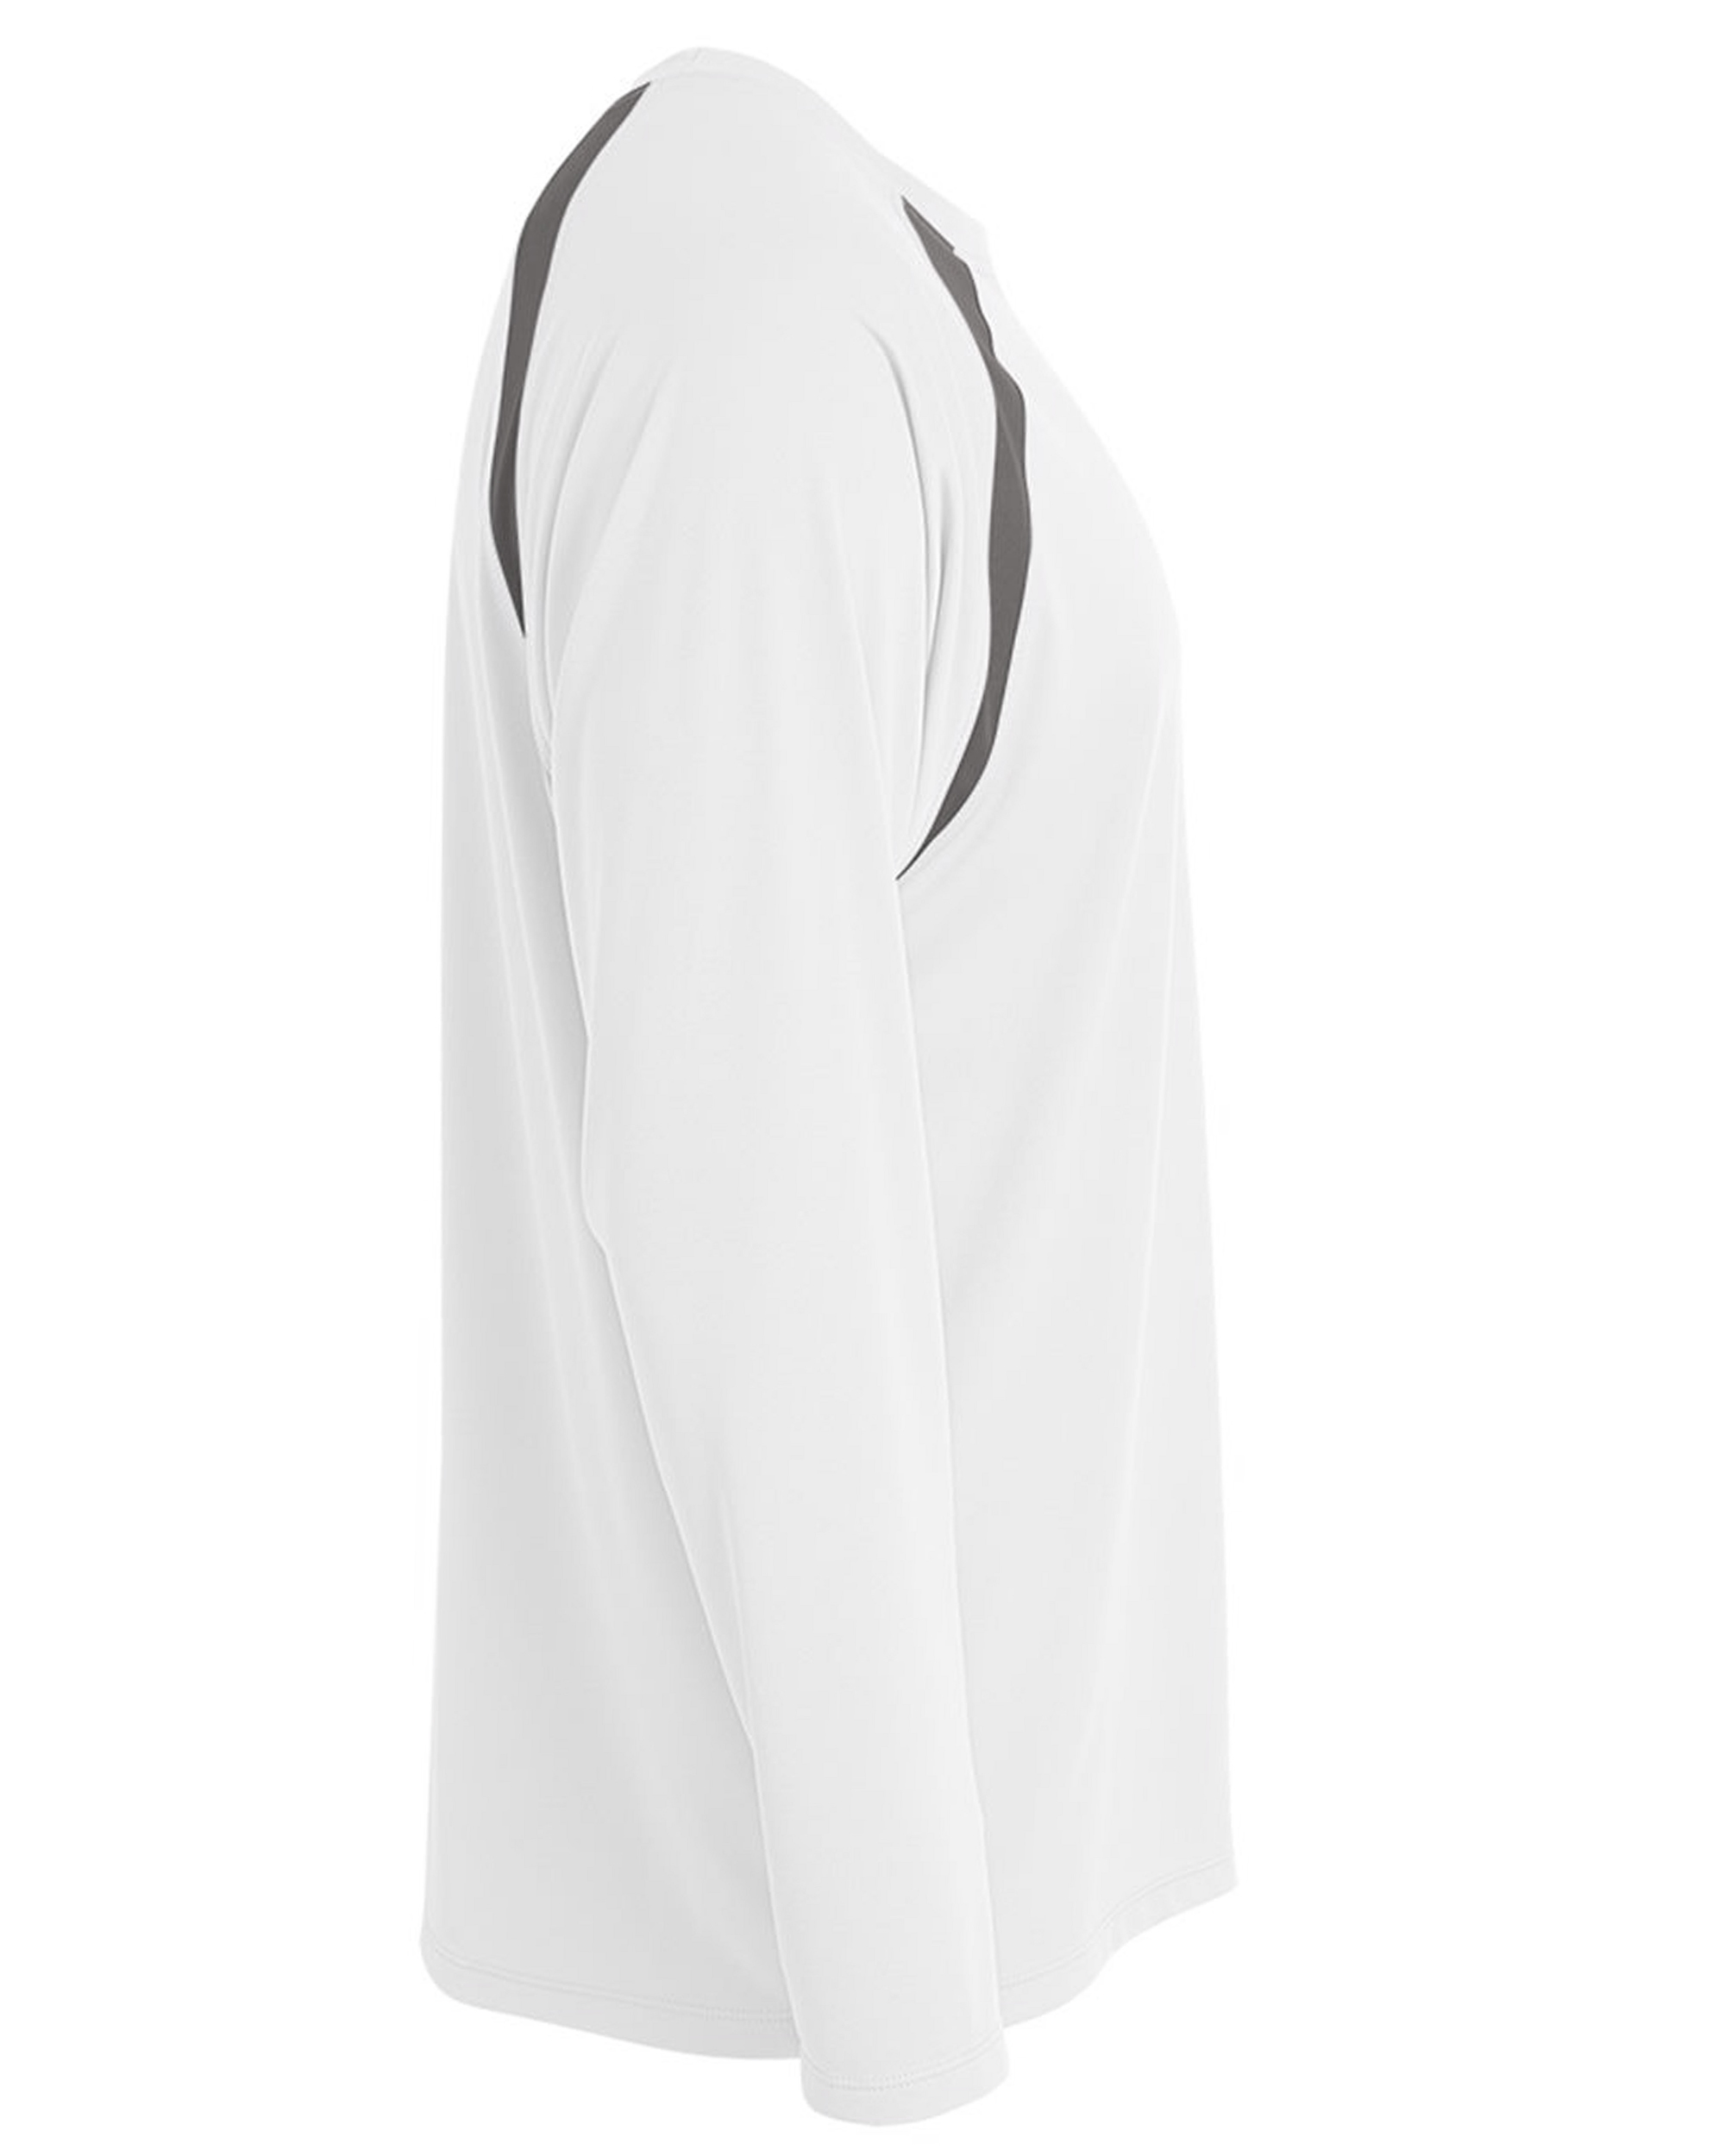 Men-039-s-Long-Sleeve-Loose-Fit-Rash-Guard-Surf-Shirt-Water-Sports-Swimwear thumbnail 29